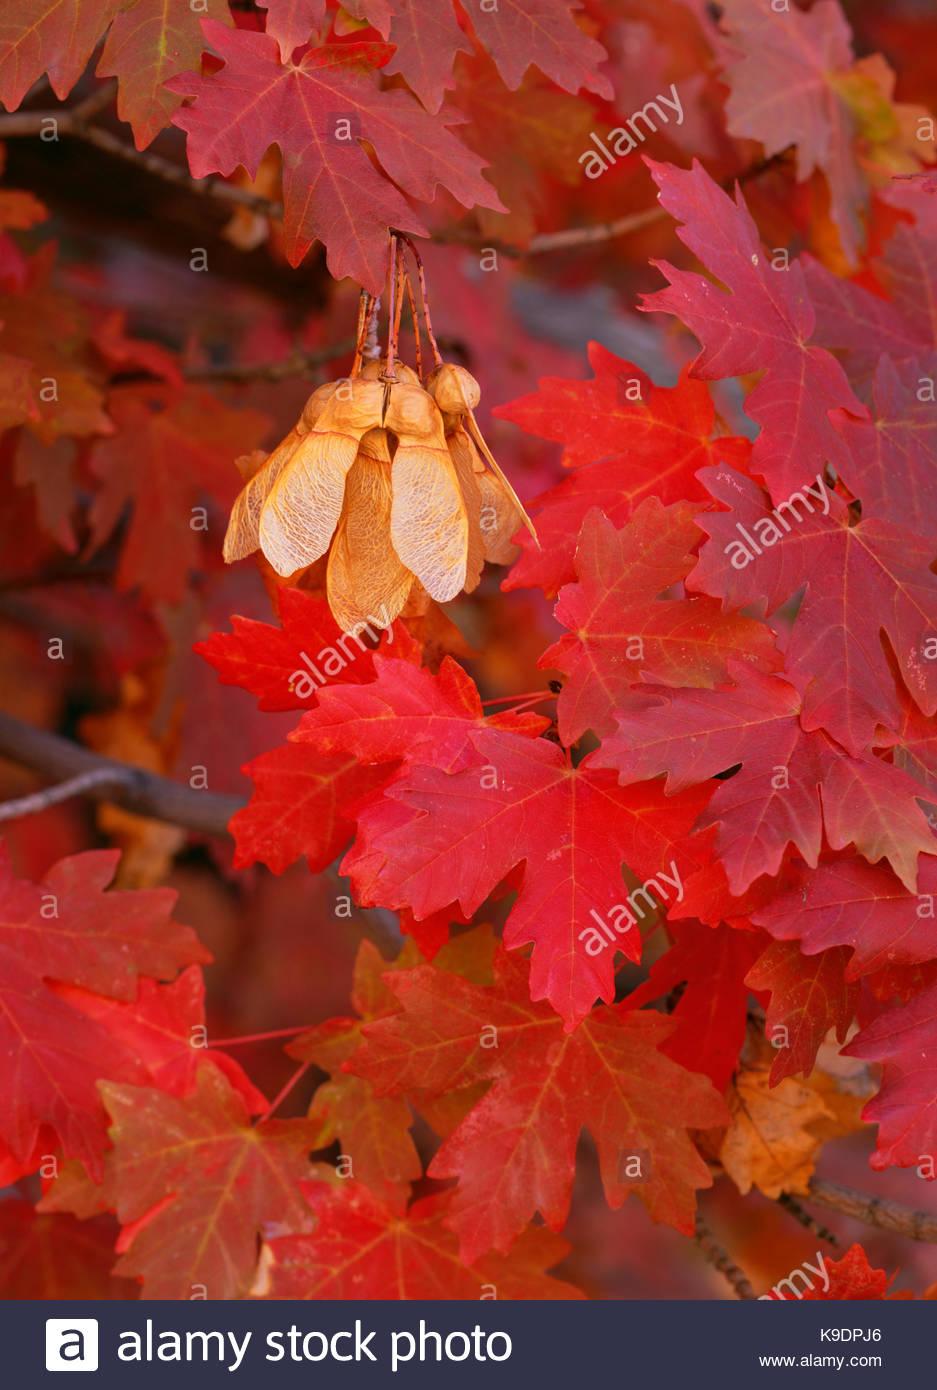 Bigtooth foglie di acero e semi, Parco Nazionale Zion, Utah Immagini Stock